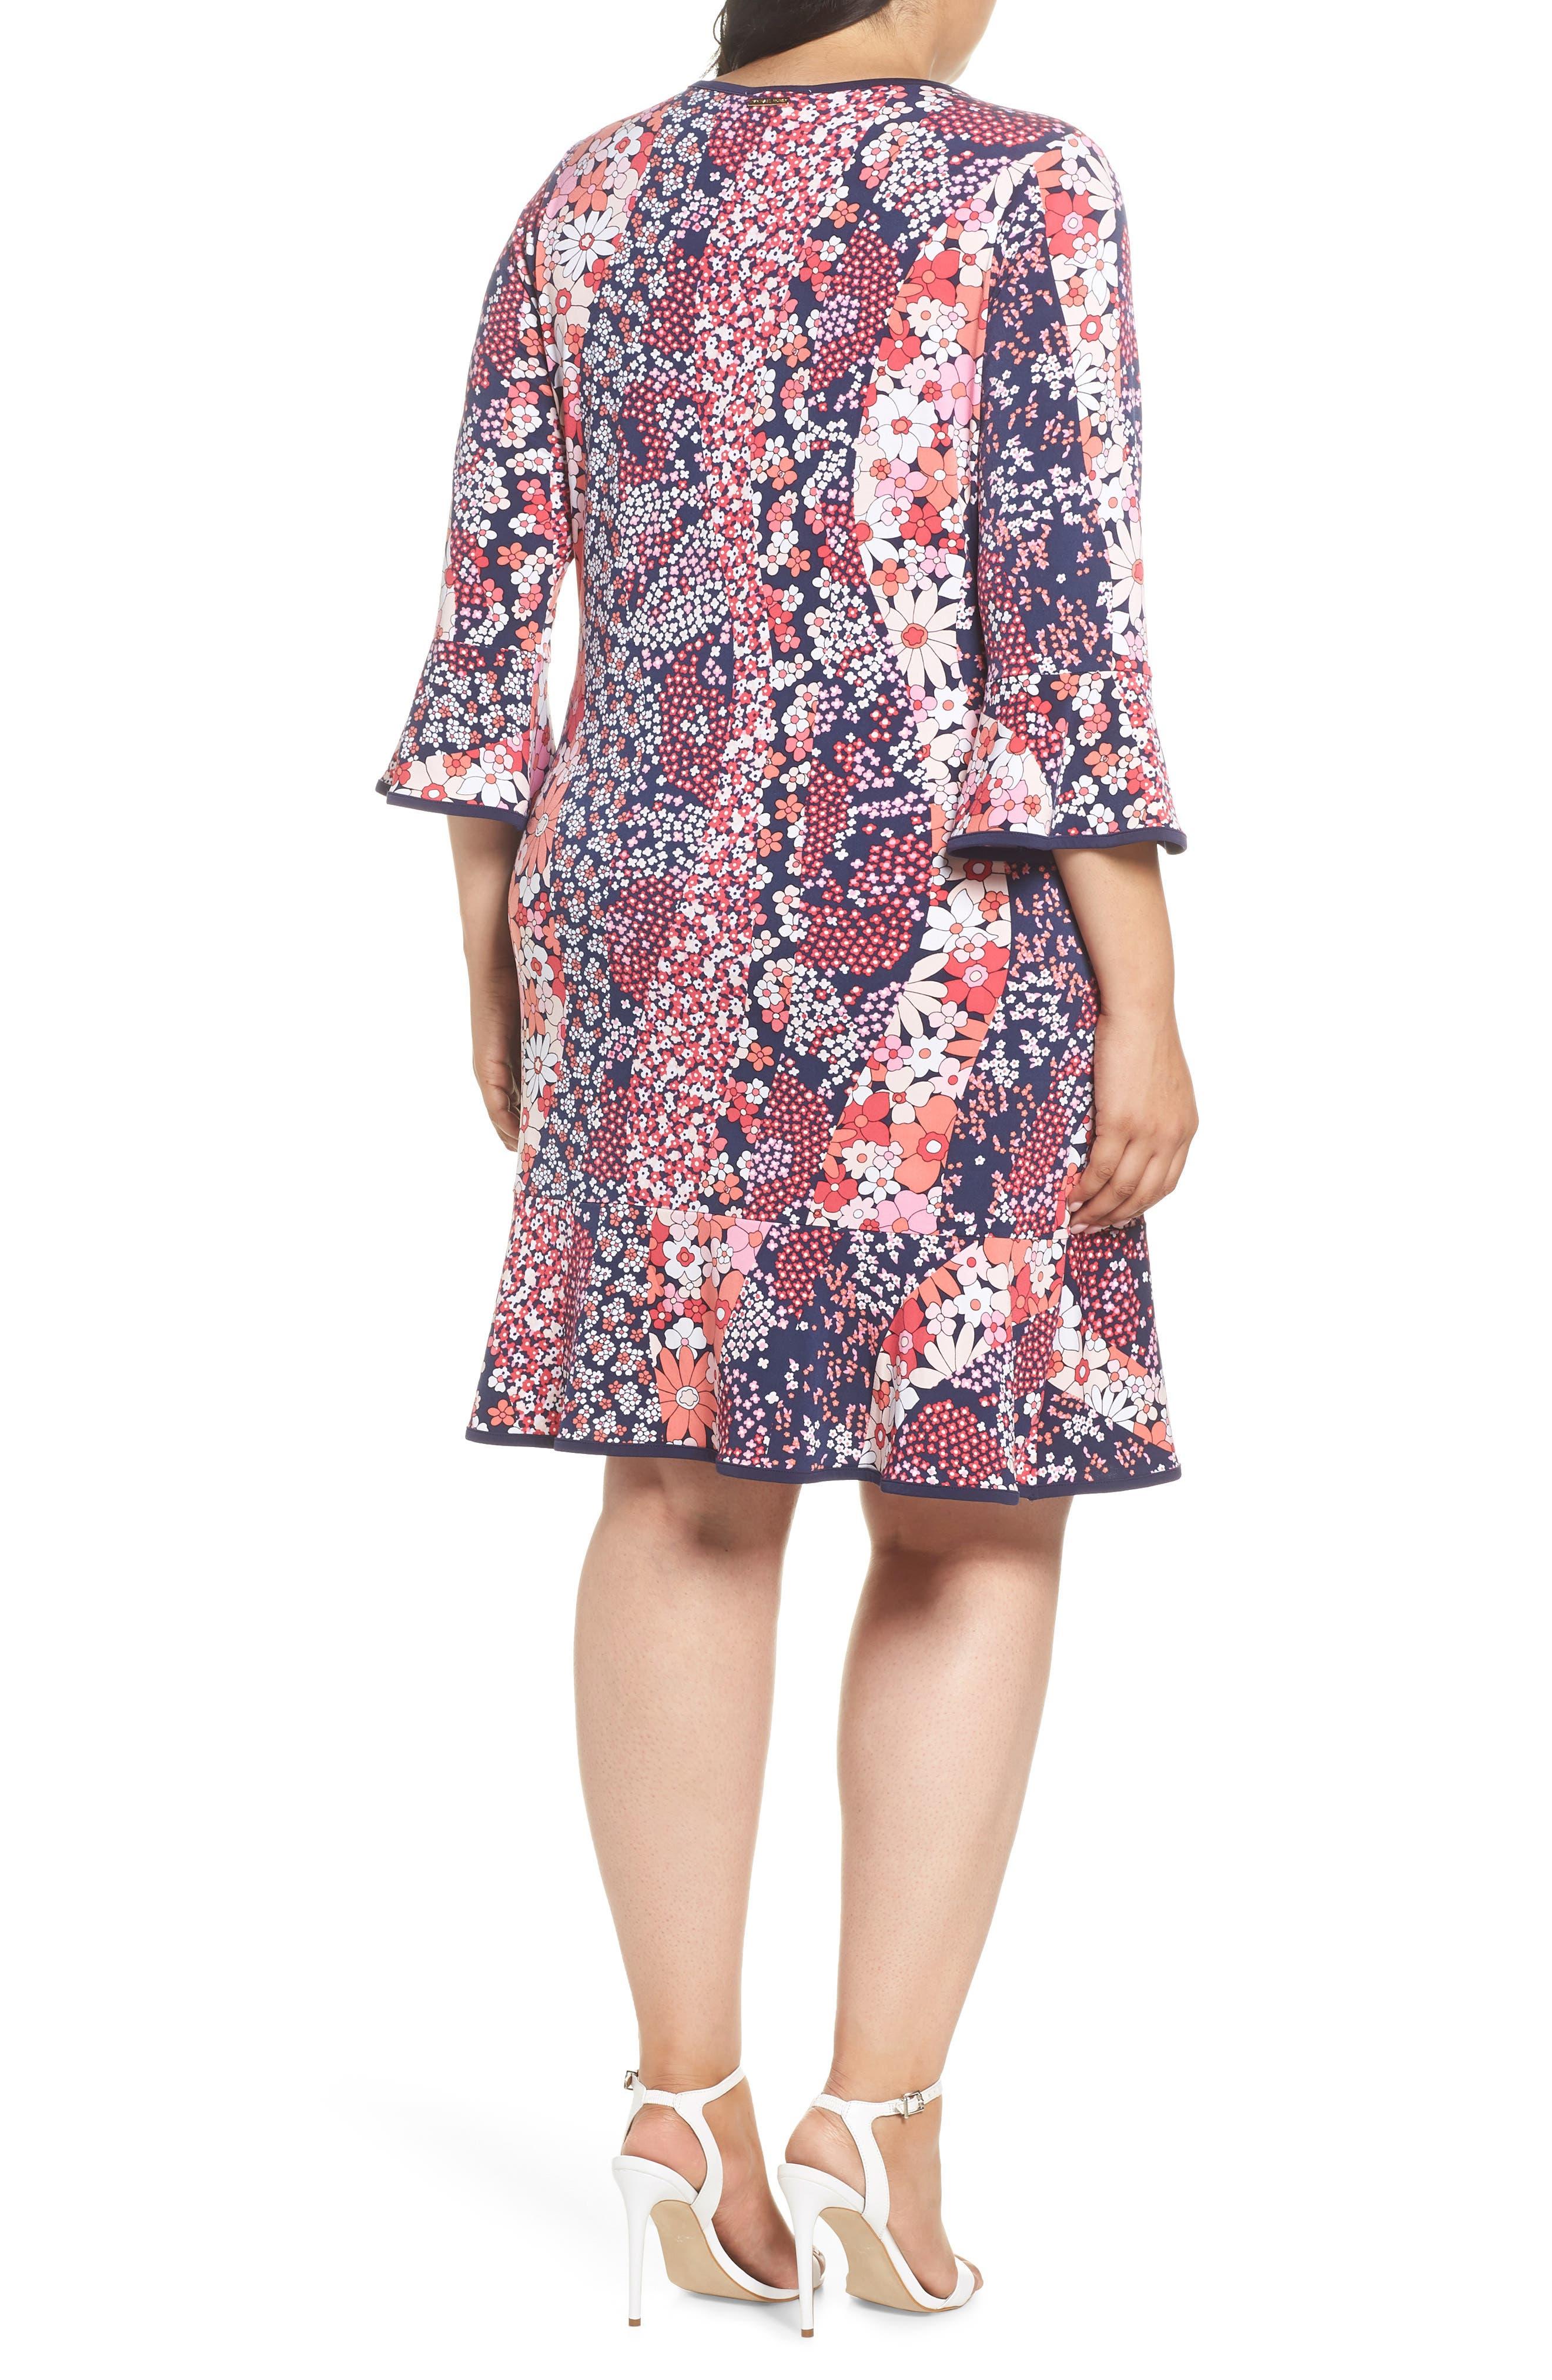 MICHAEL MICHAEL KORS,                             Patchwork Floral Bell Sleeve Shift Dress,                             Alternate thumbnail 2, color,                             679